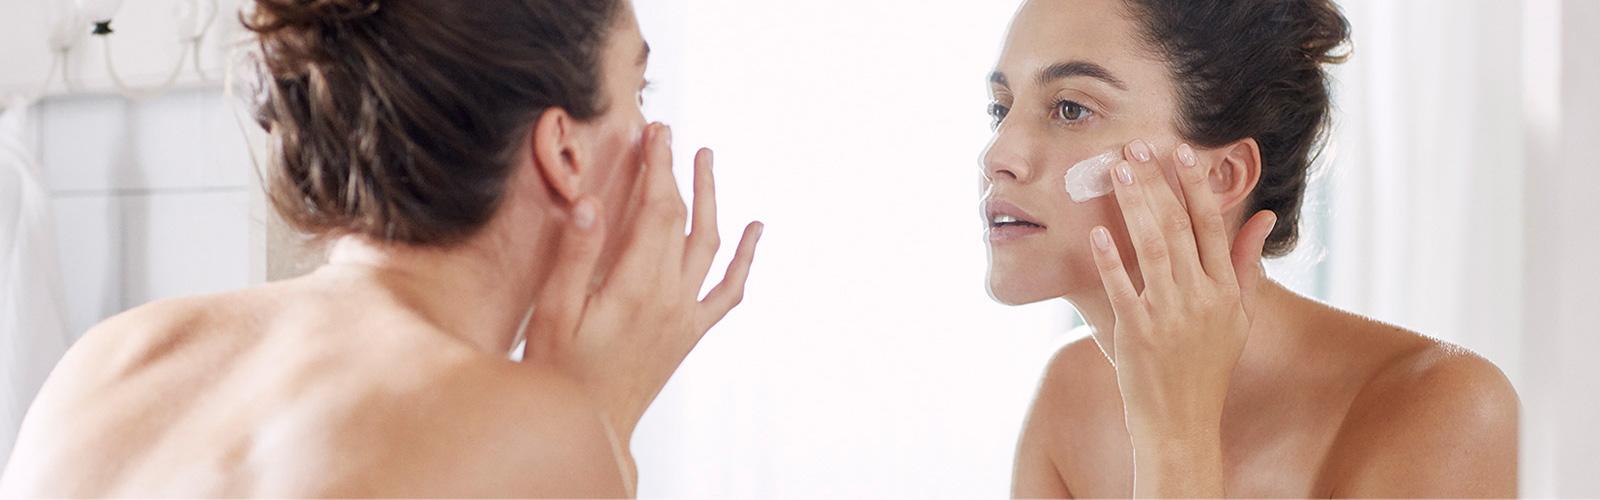 Woman moisturising herface